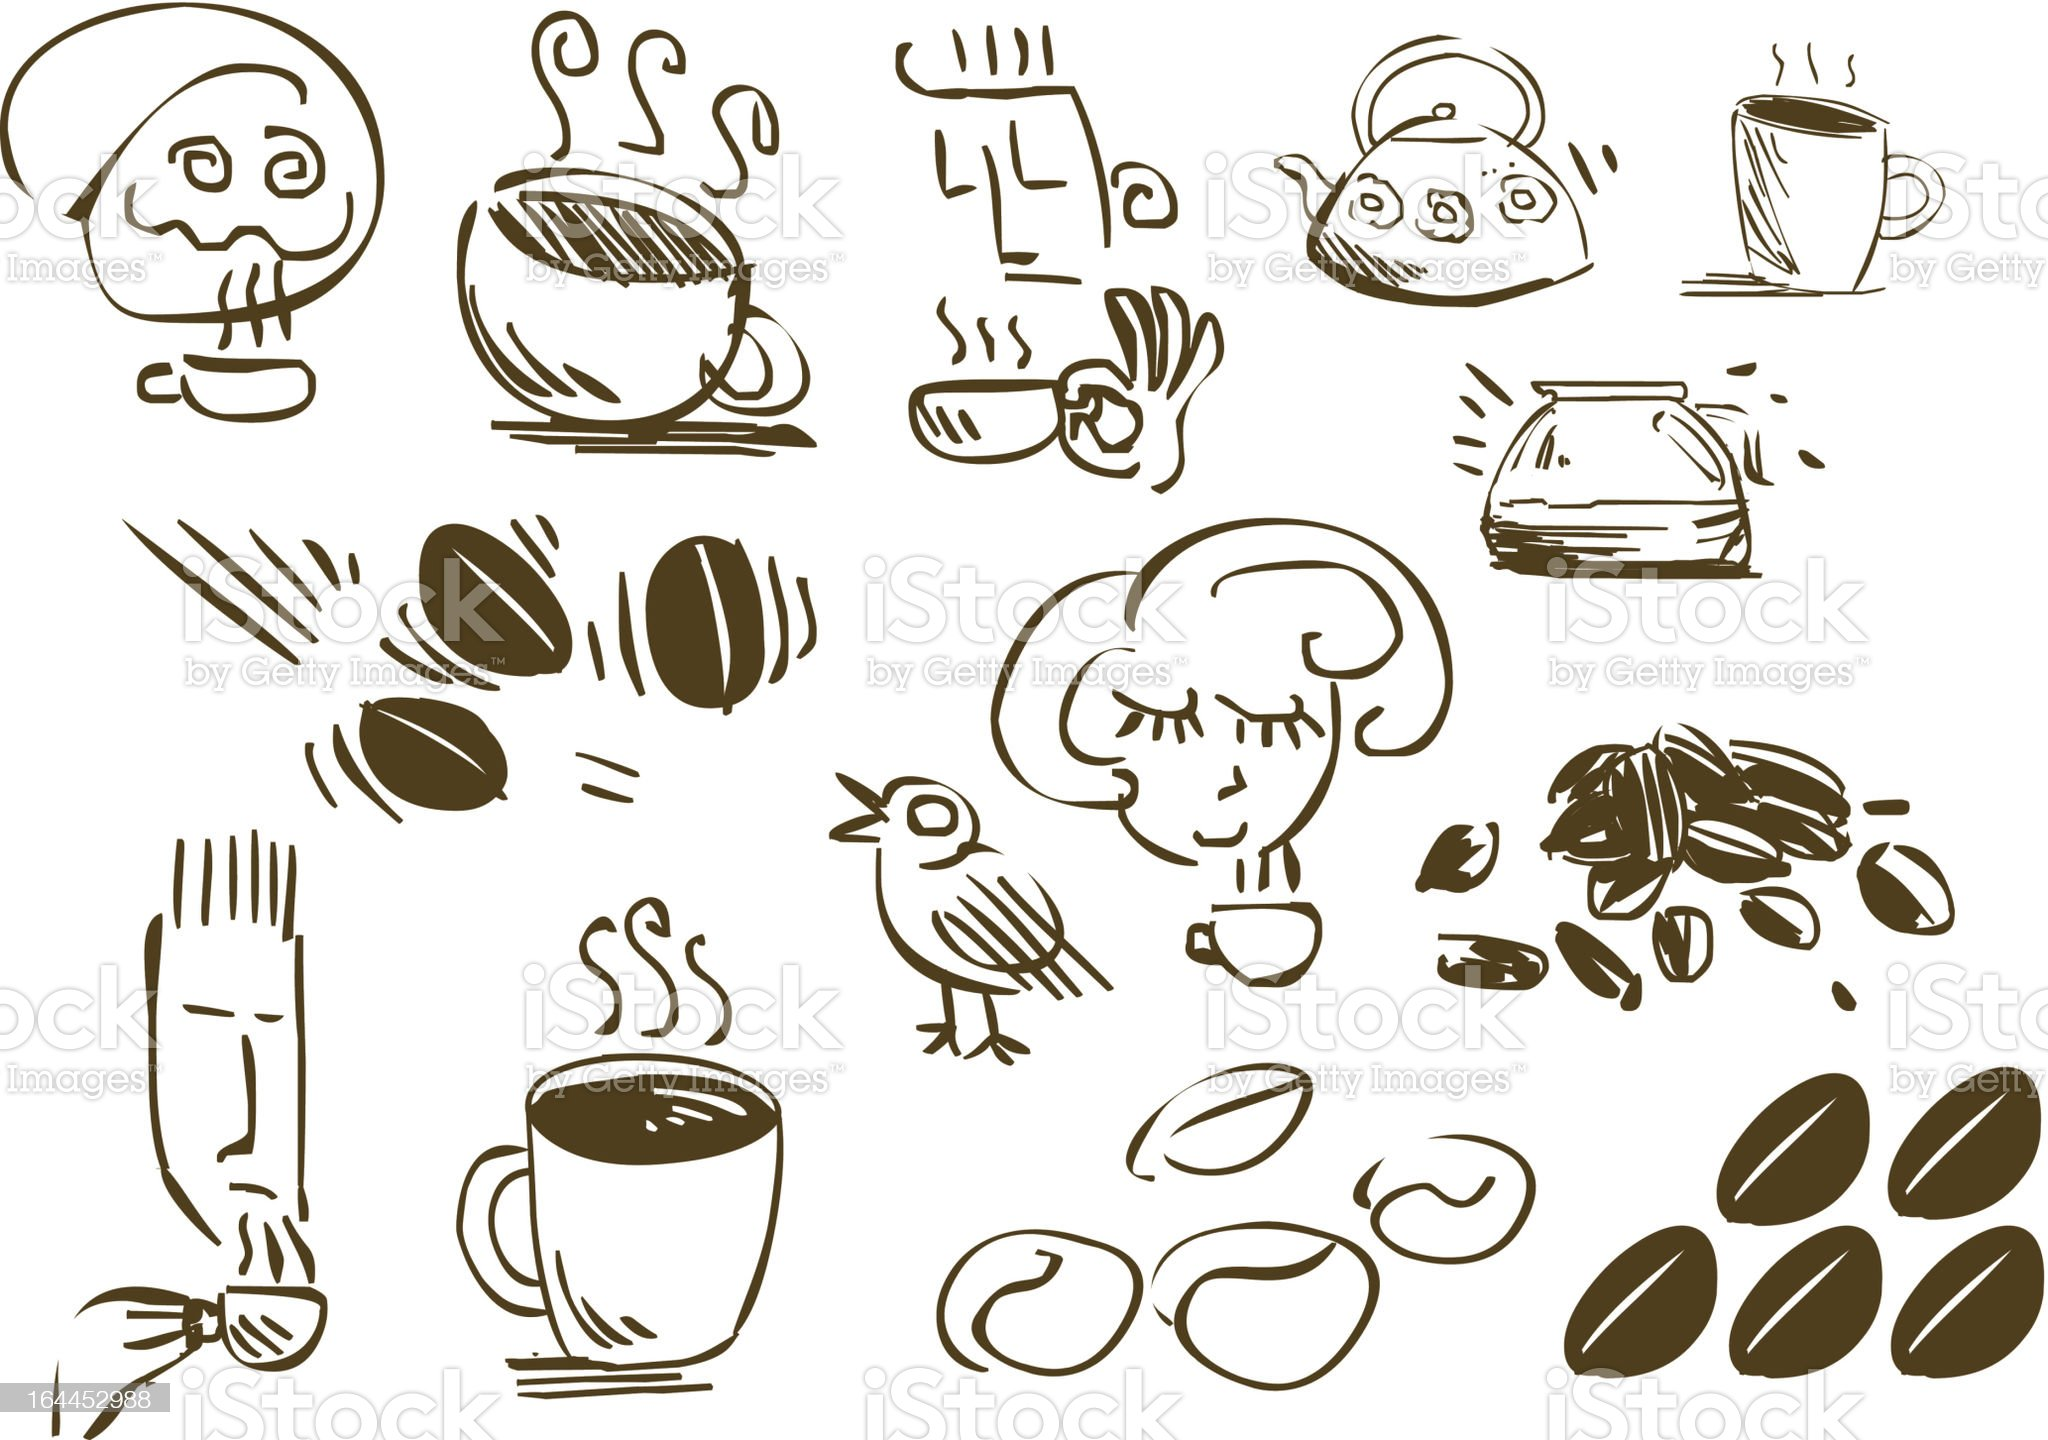 Coffee Doodles royalty-free stock vector art